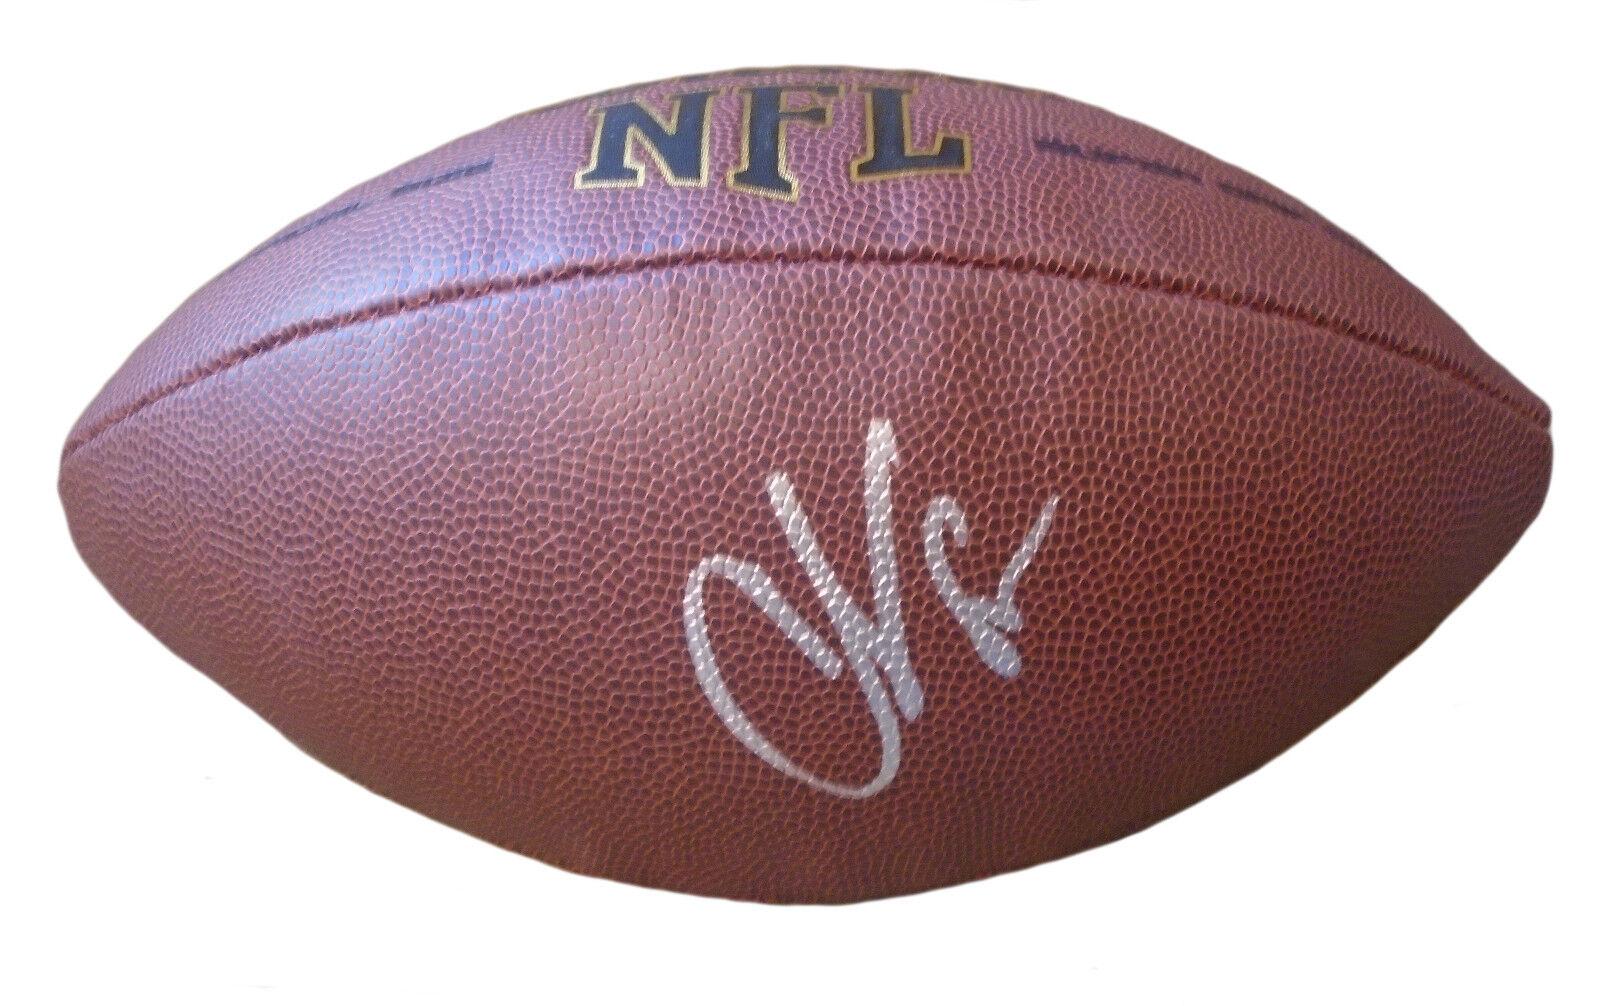 Bengals Patriots Ocho Cinco Chad Johnson Firmado NFL Football a Prueba